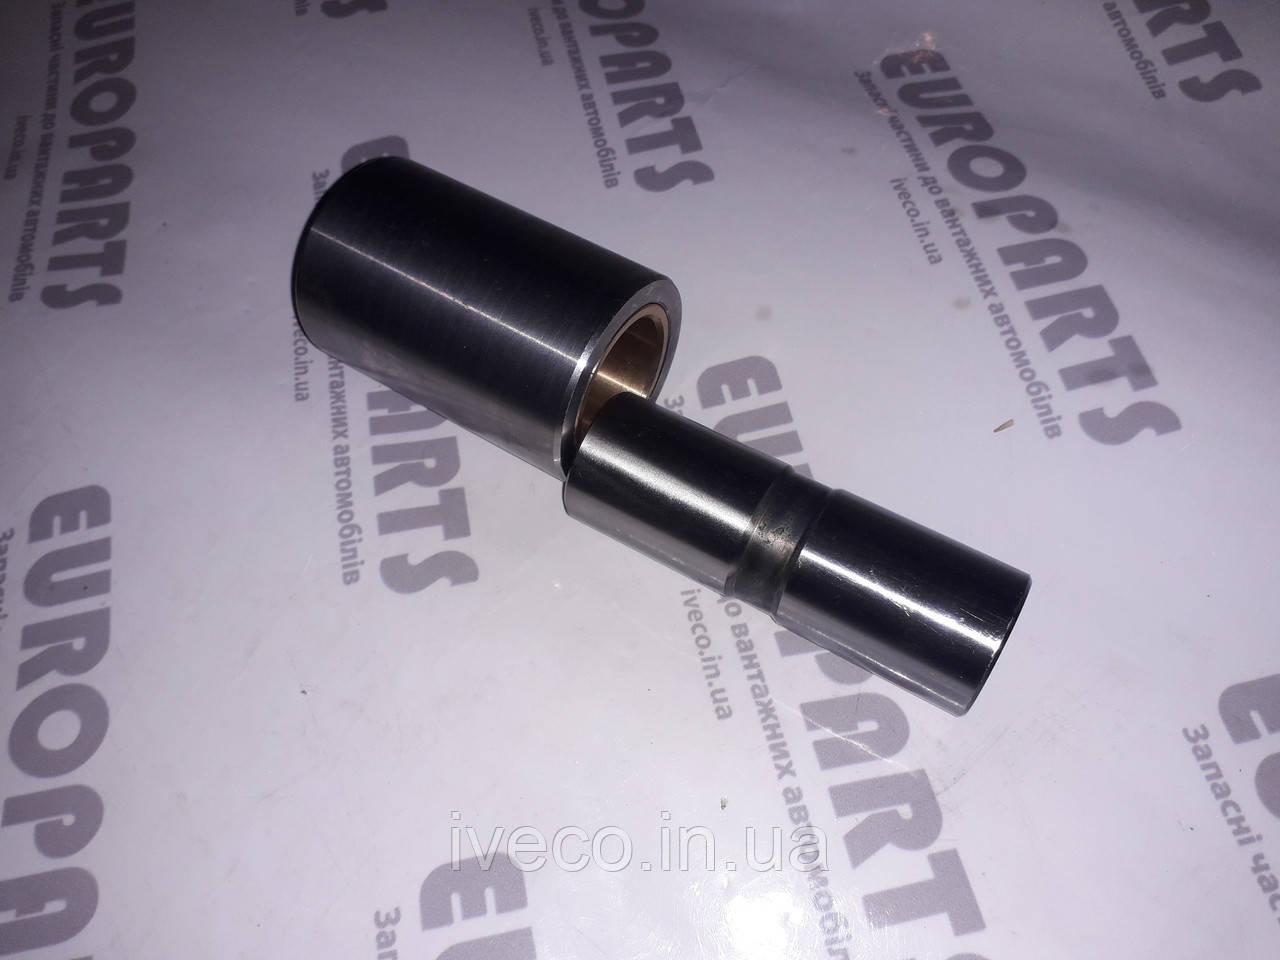 Втулка рессоры задняя, палец  ASTRA HD8 [4x2/4x4/6x4/6x6/8x4] 720231 Errevi 183537